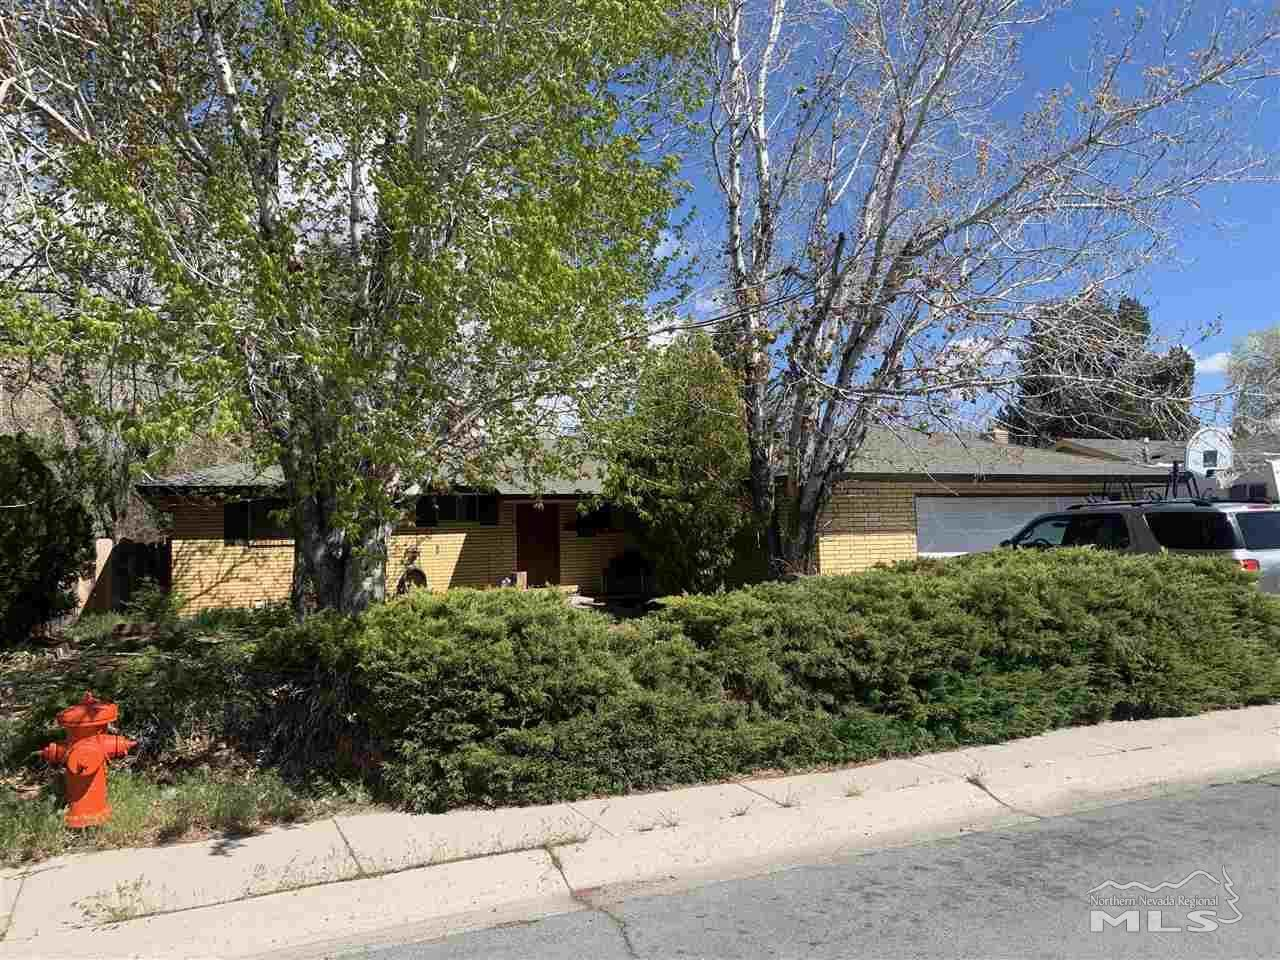 2513 Lewis Dr, Carson City, NV 89701-5651 - MLS#: 210005771